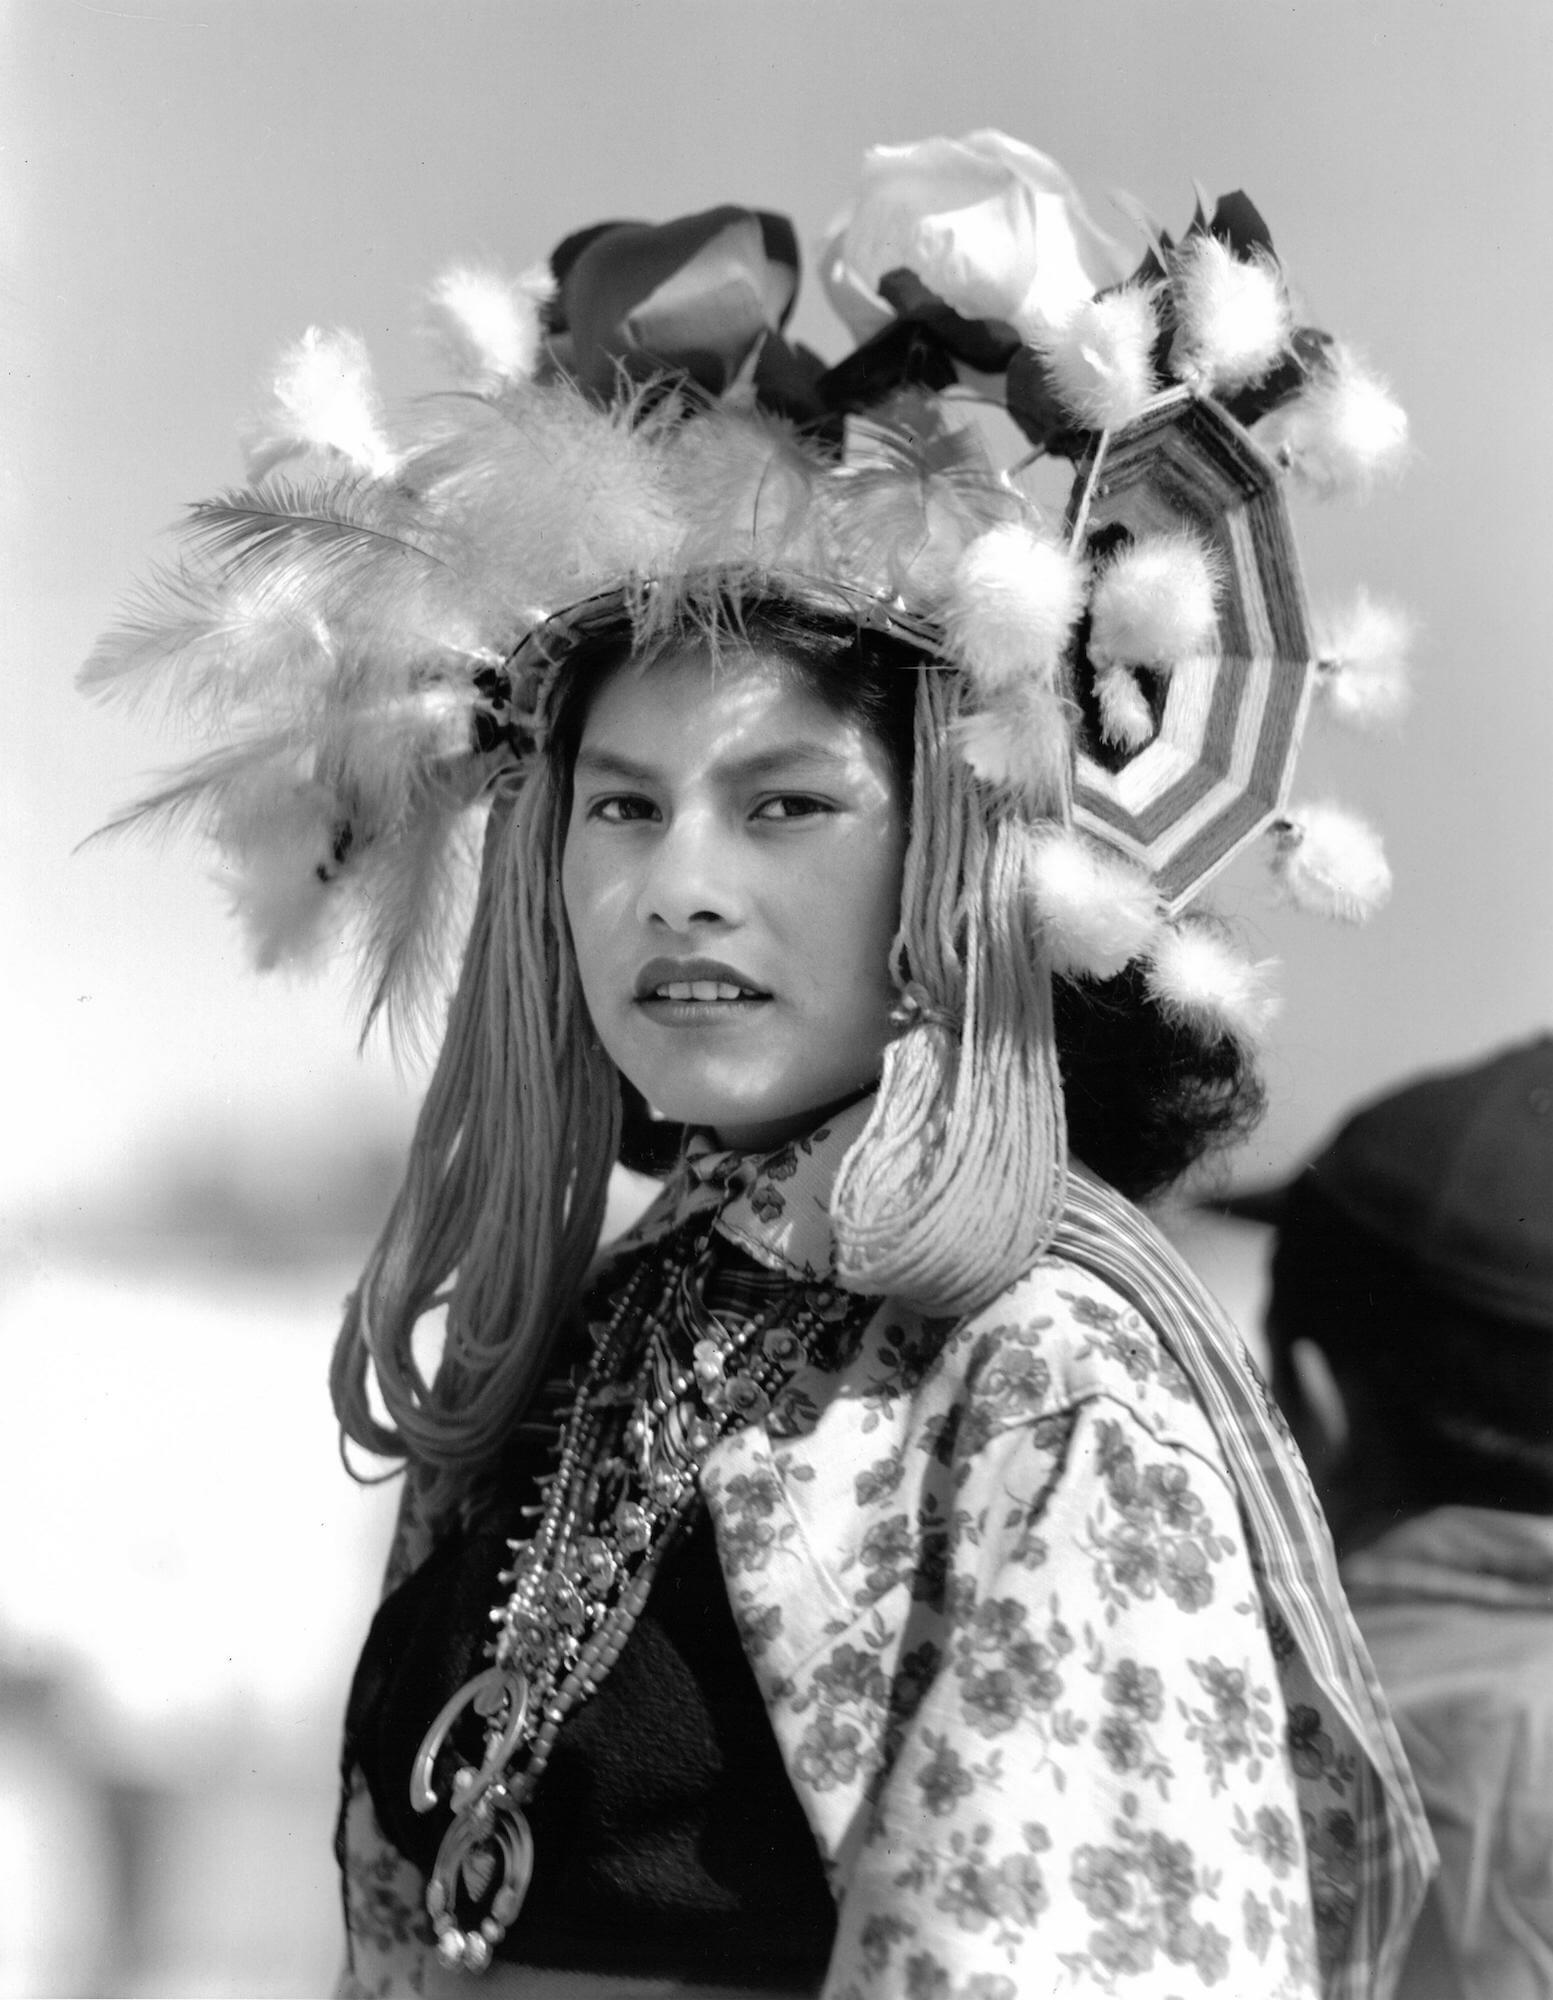 Young Hopi Woman, Arizona, 1940s